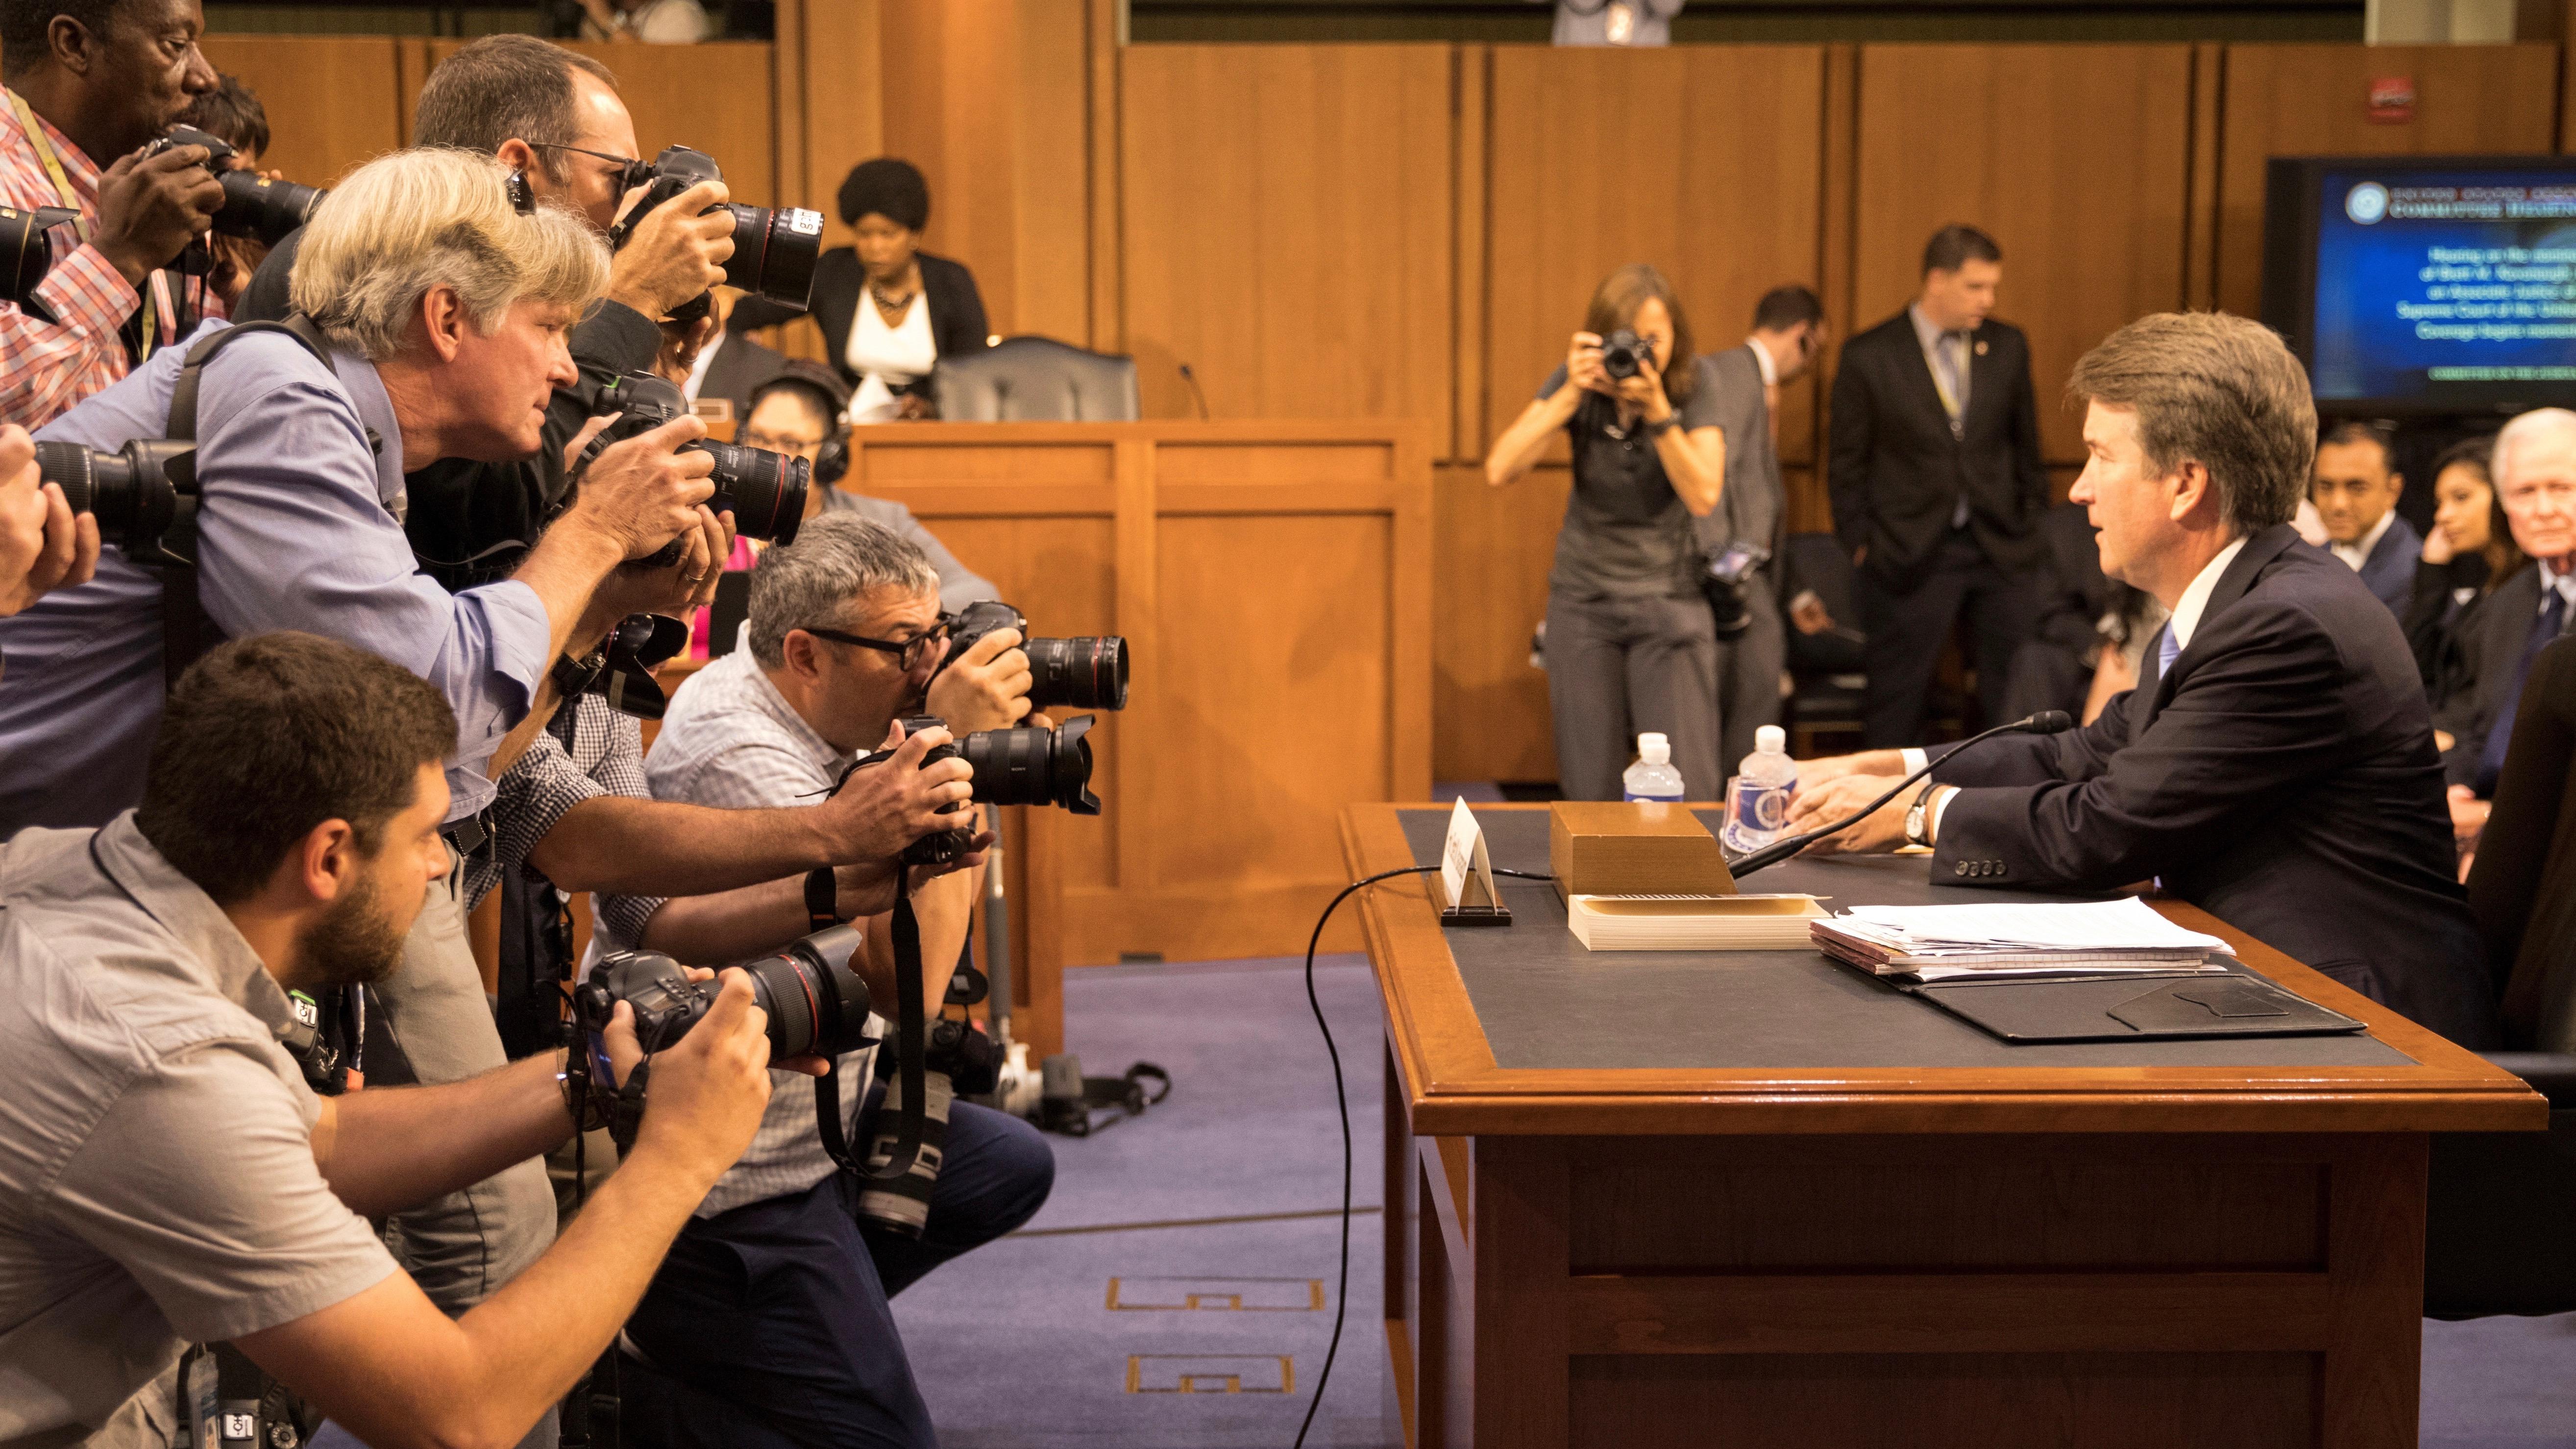 US Supreme Court nominee Brett Kavanaugh testifies in Washington